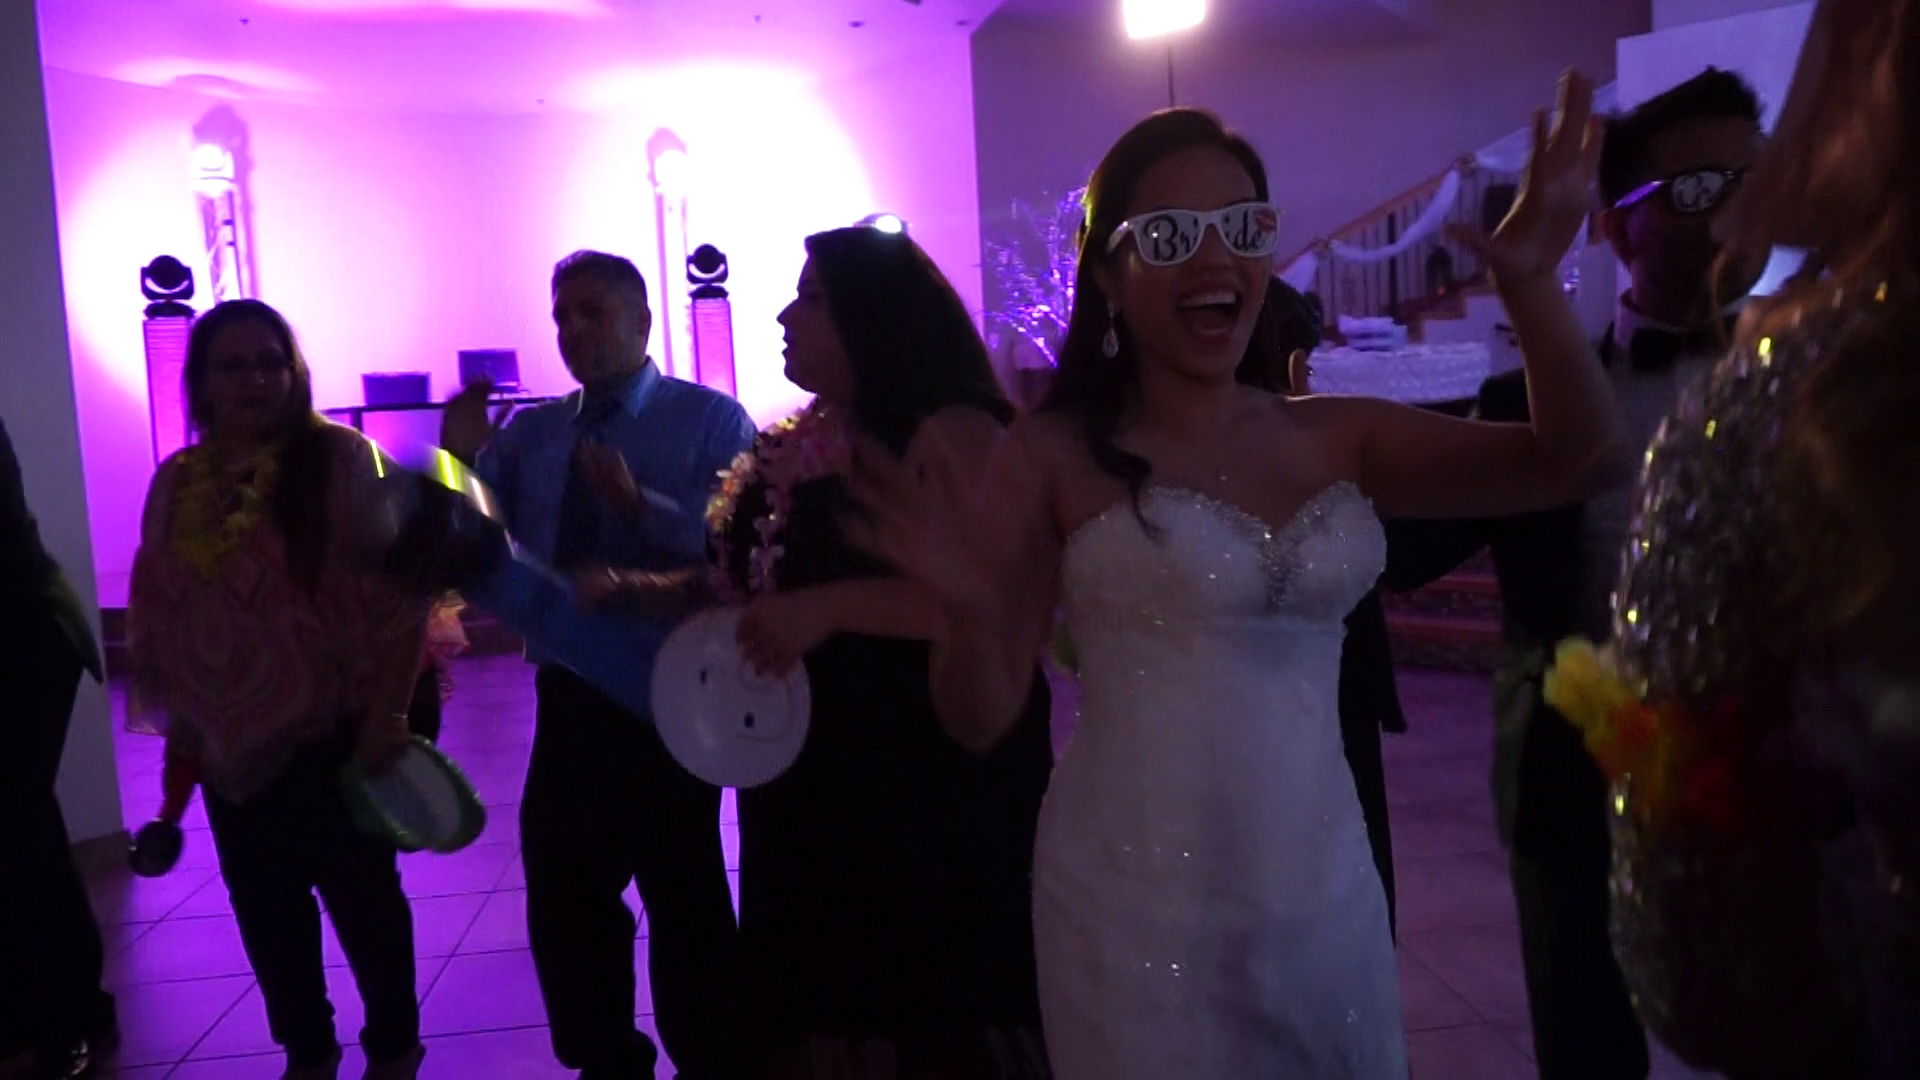 Bride Dancing at her own Wedding